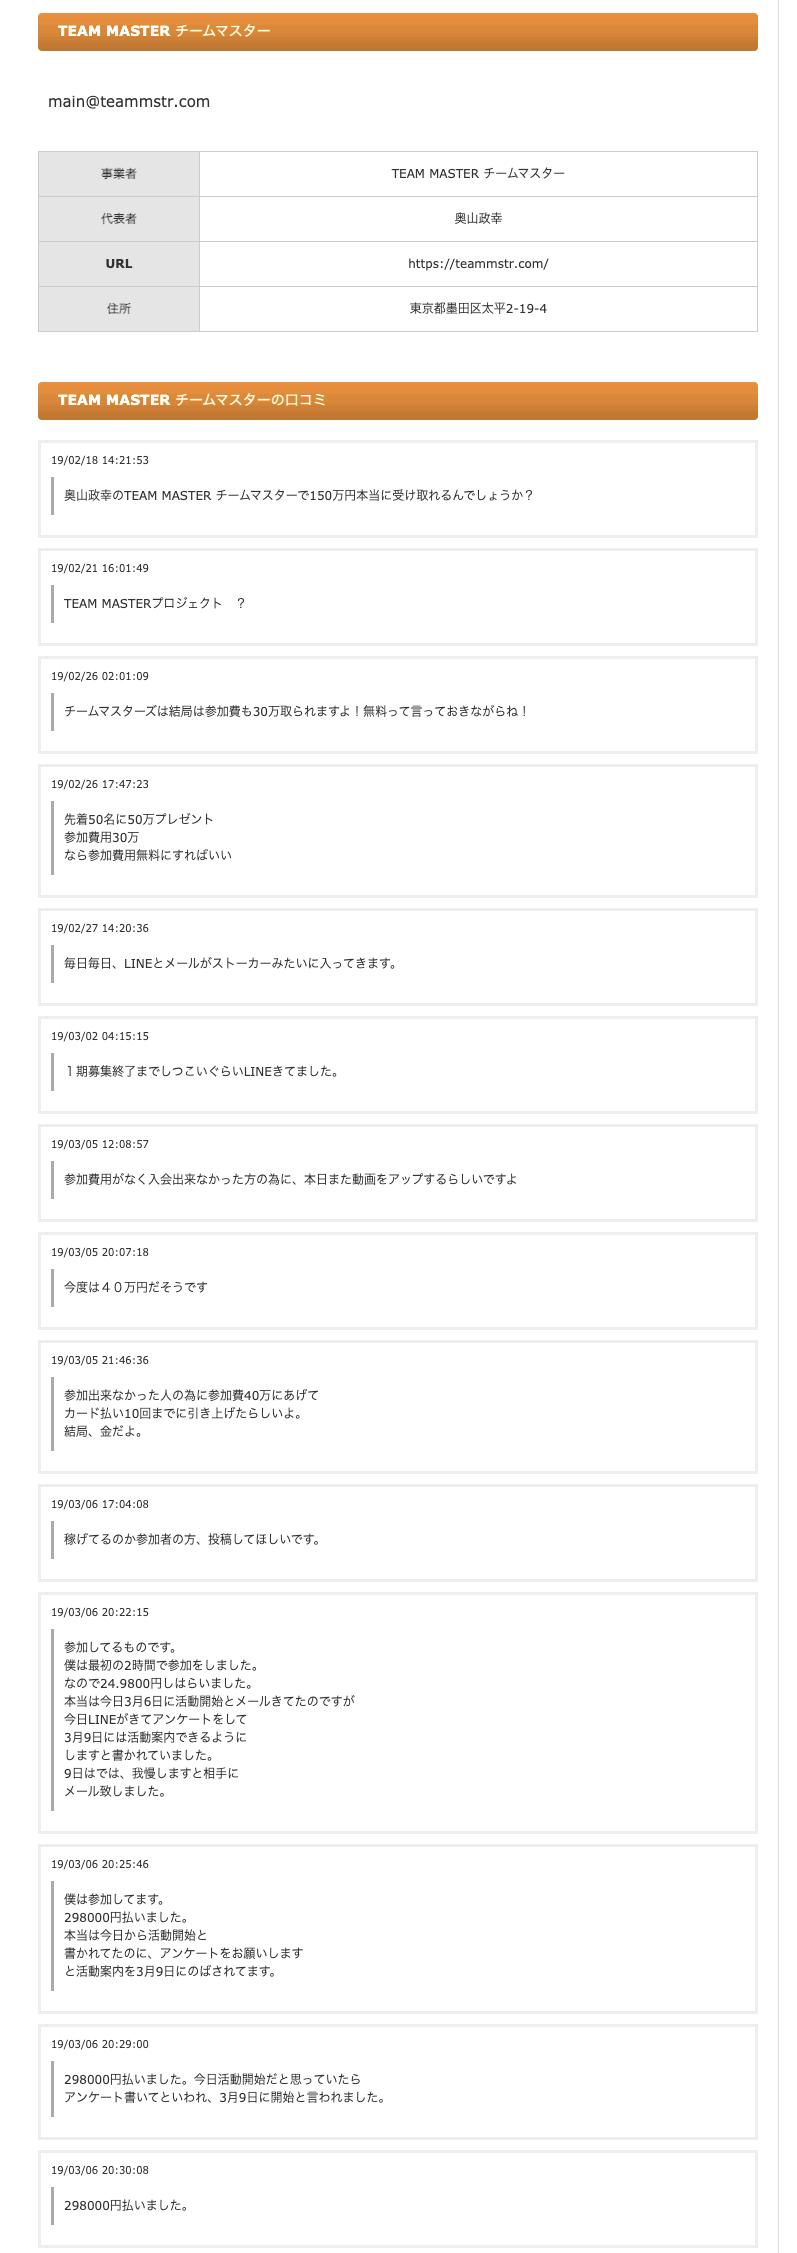 奥山政幸 TEAM MASTER 詐欺 口コミ 評判